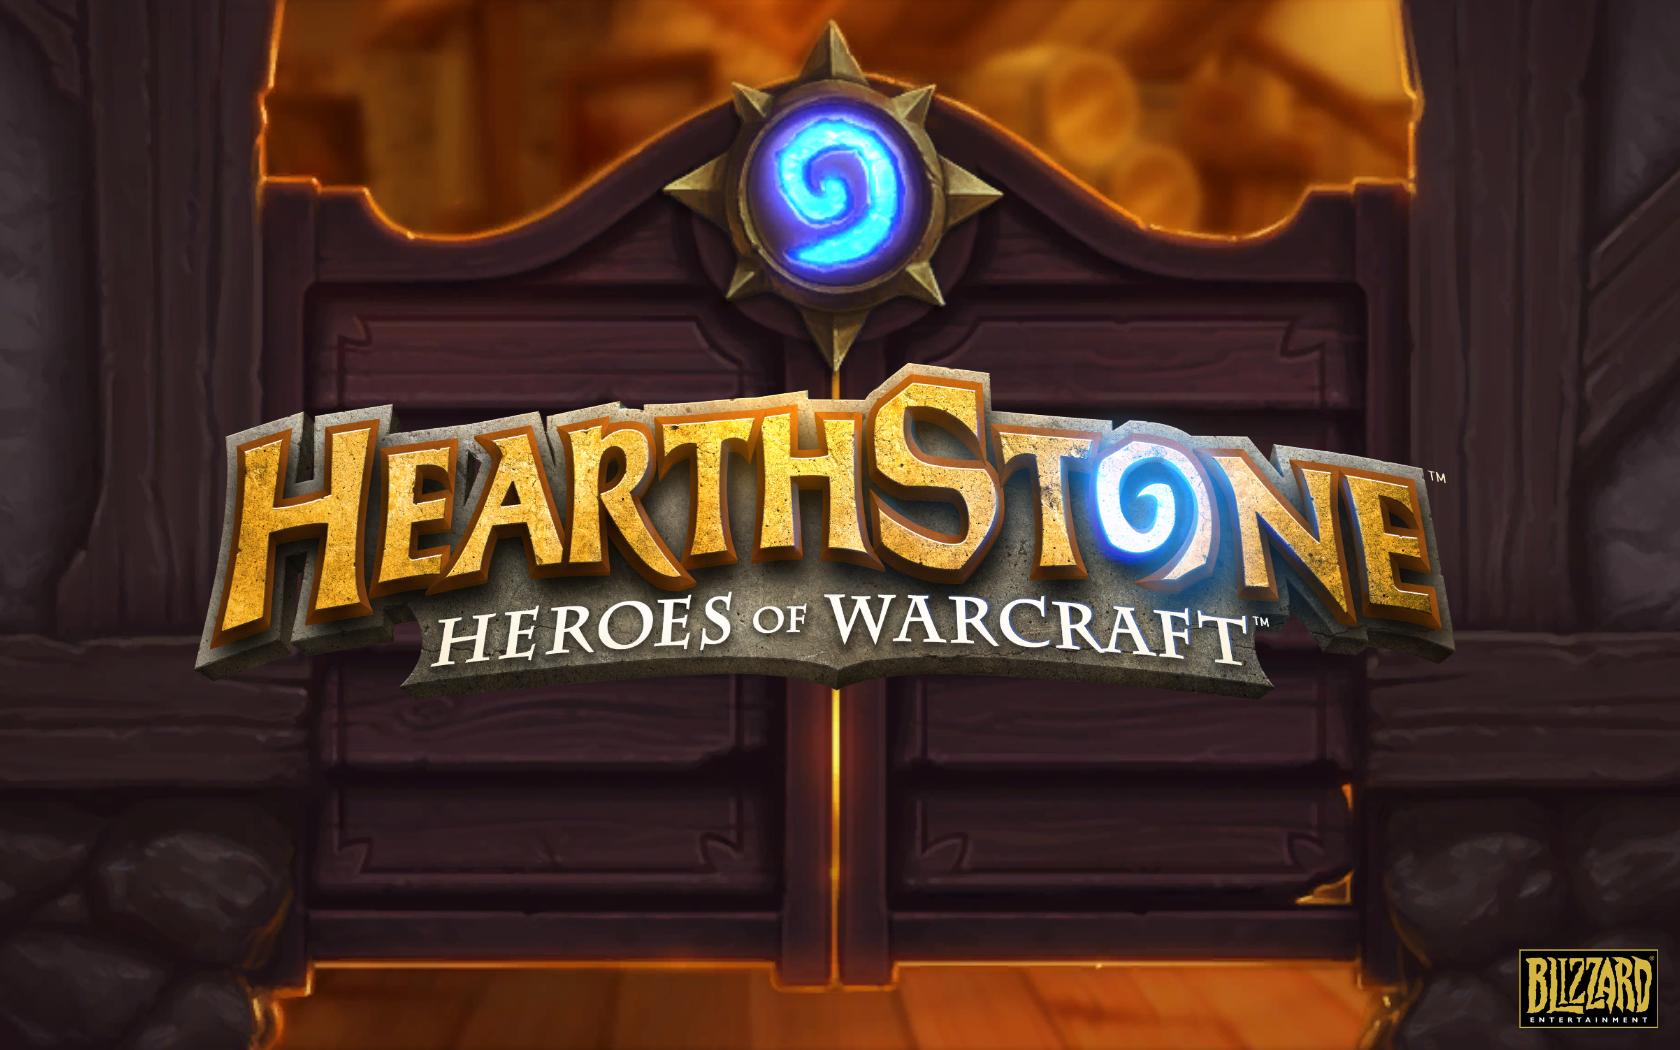 Hearthstone Review Screenshot Wallpaper Title Screen Heroes Of Warcraft Maps Texture Logo 96968 1920x1080